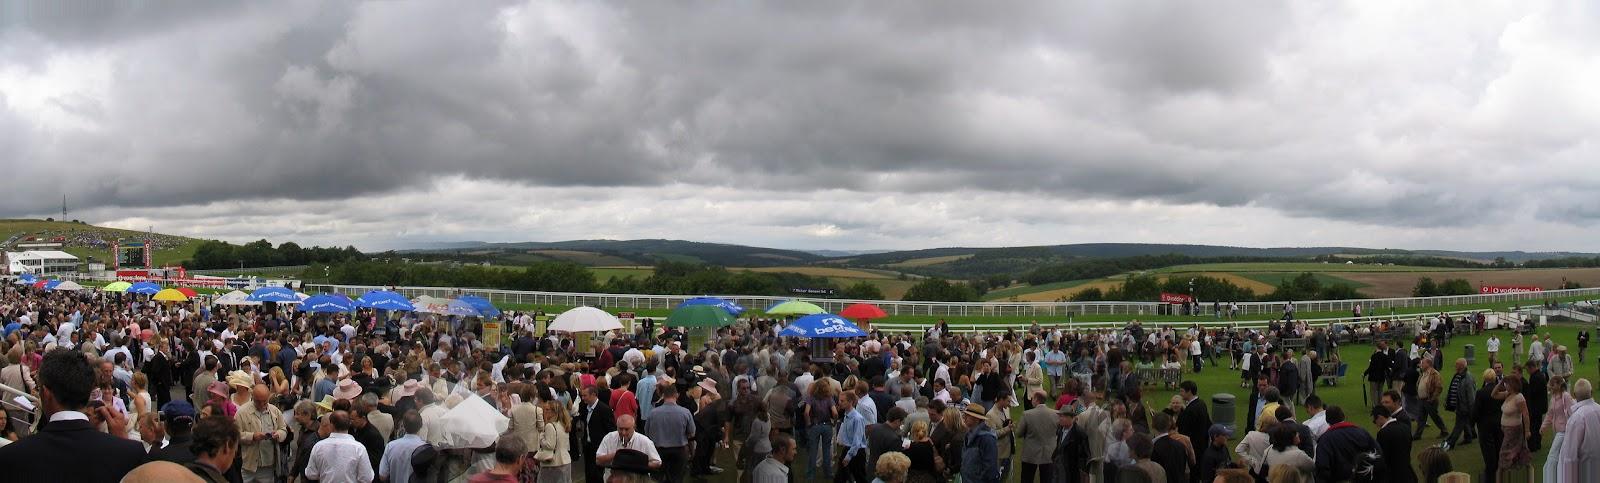 panorama3_50.jpg